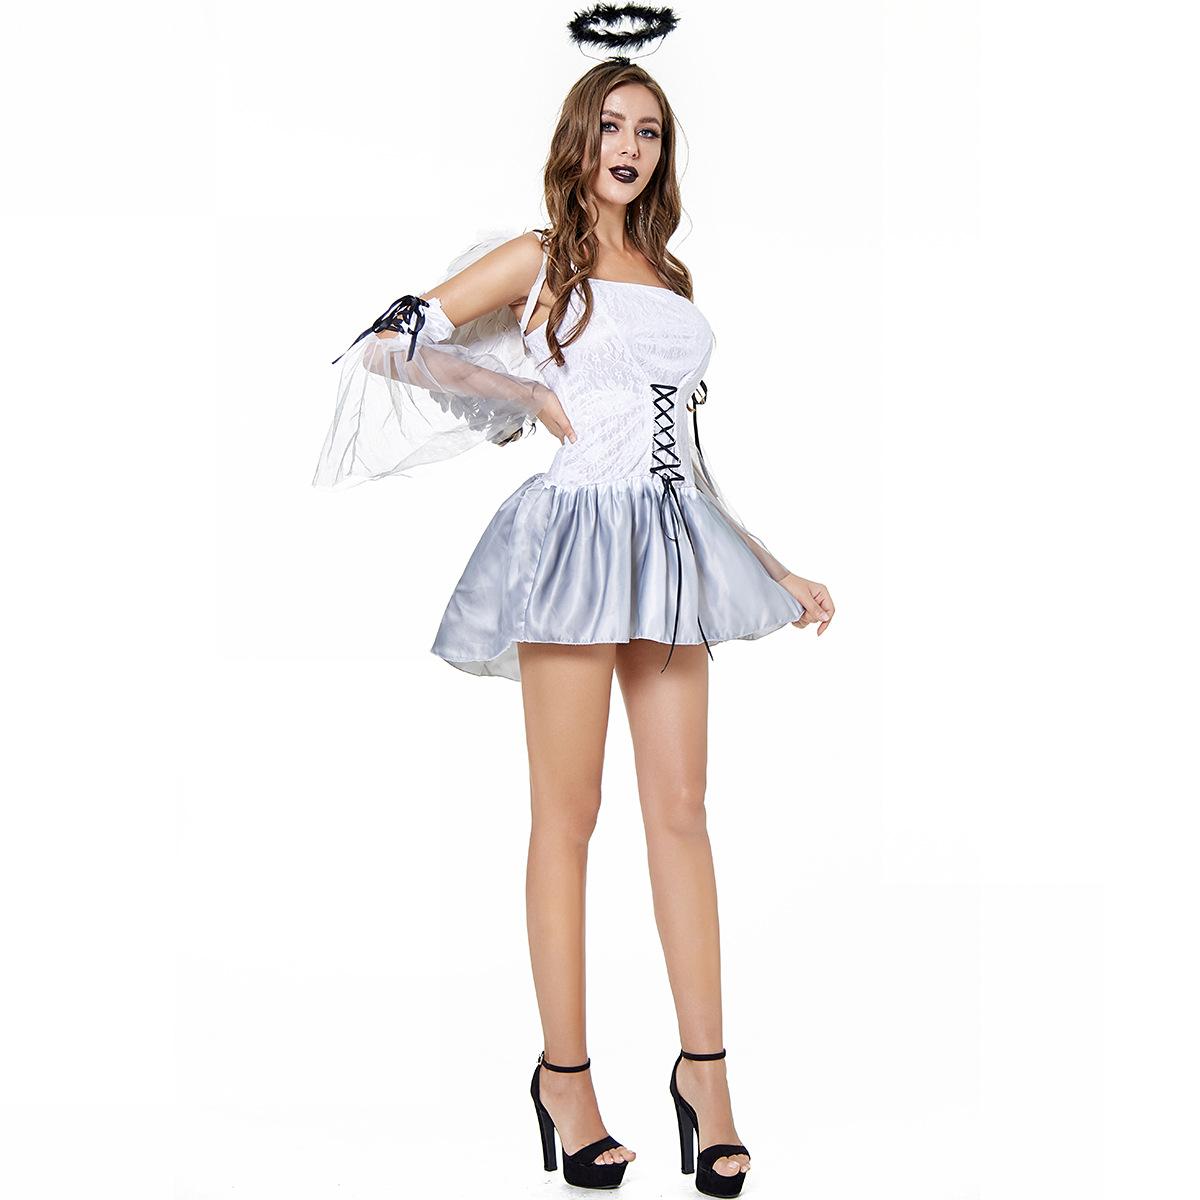 Halloween women's costume Sexy Dark Angel Costume game uniform evil angel costume ghost bride large size 3